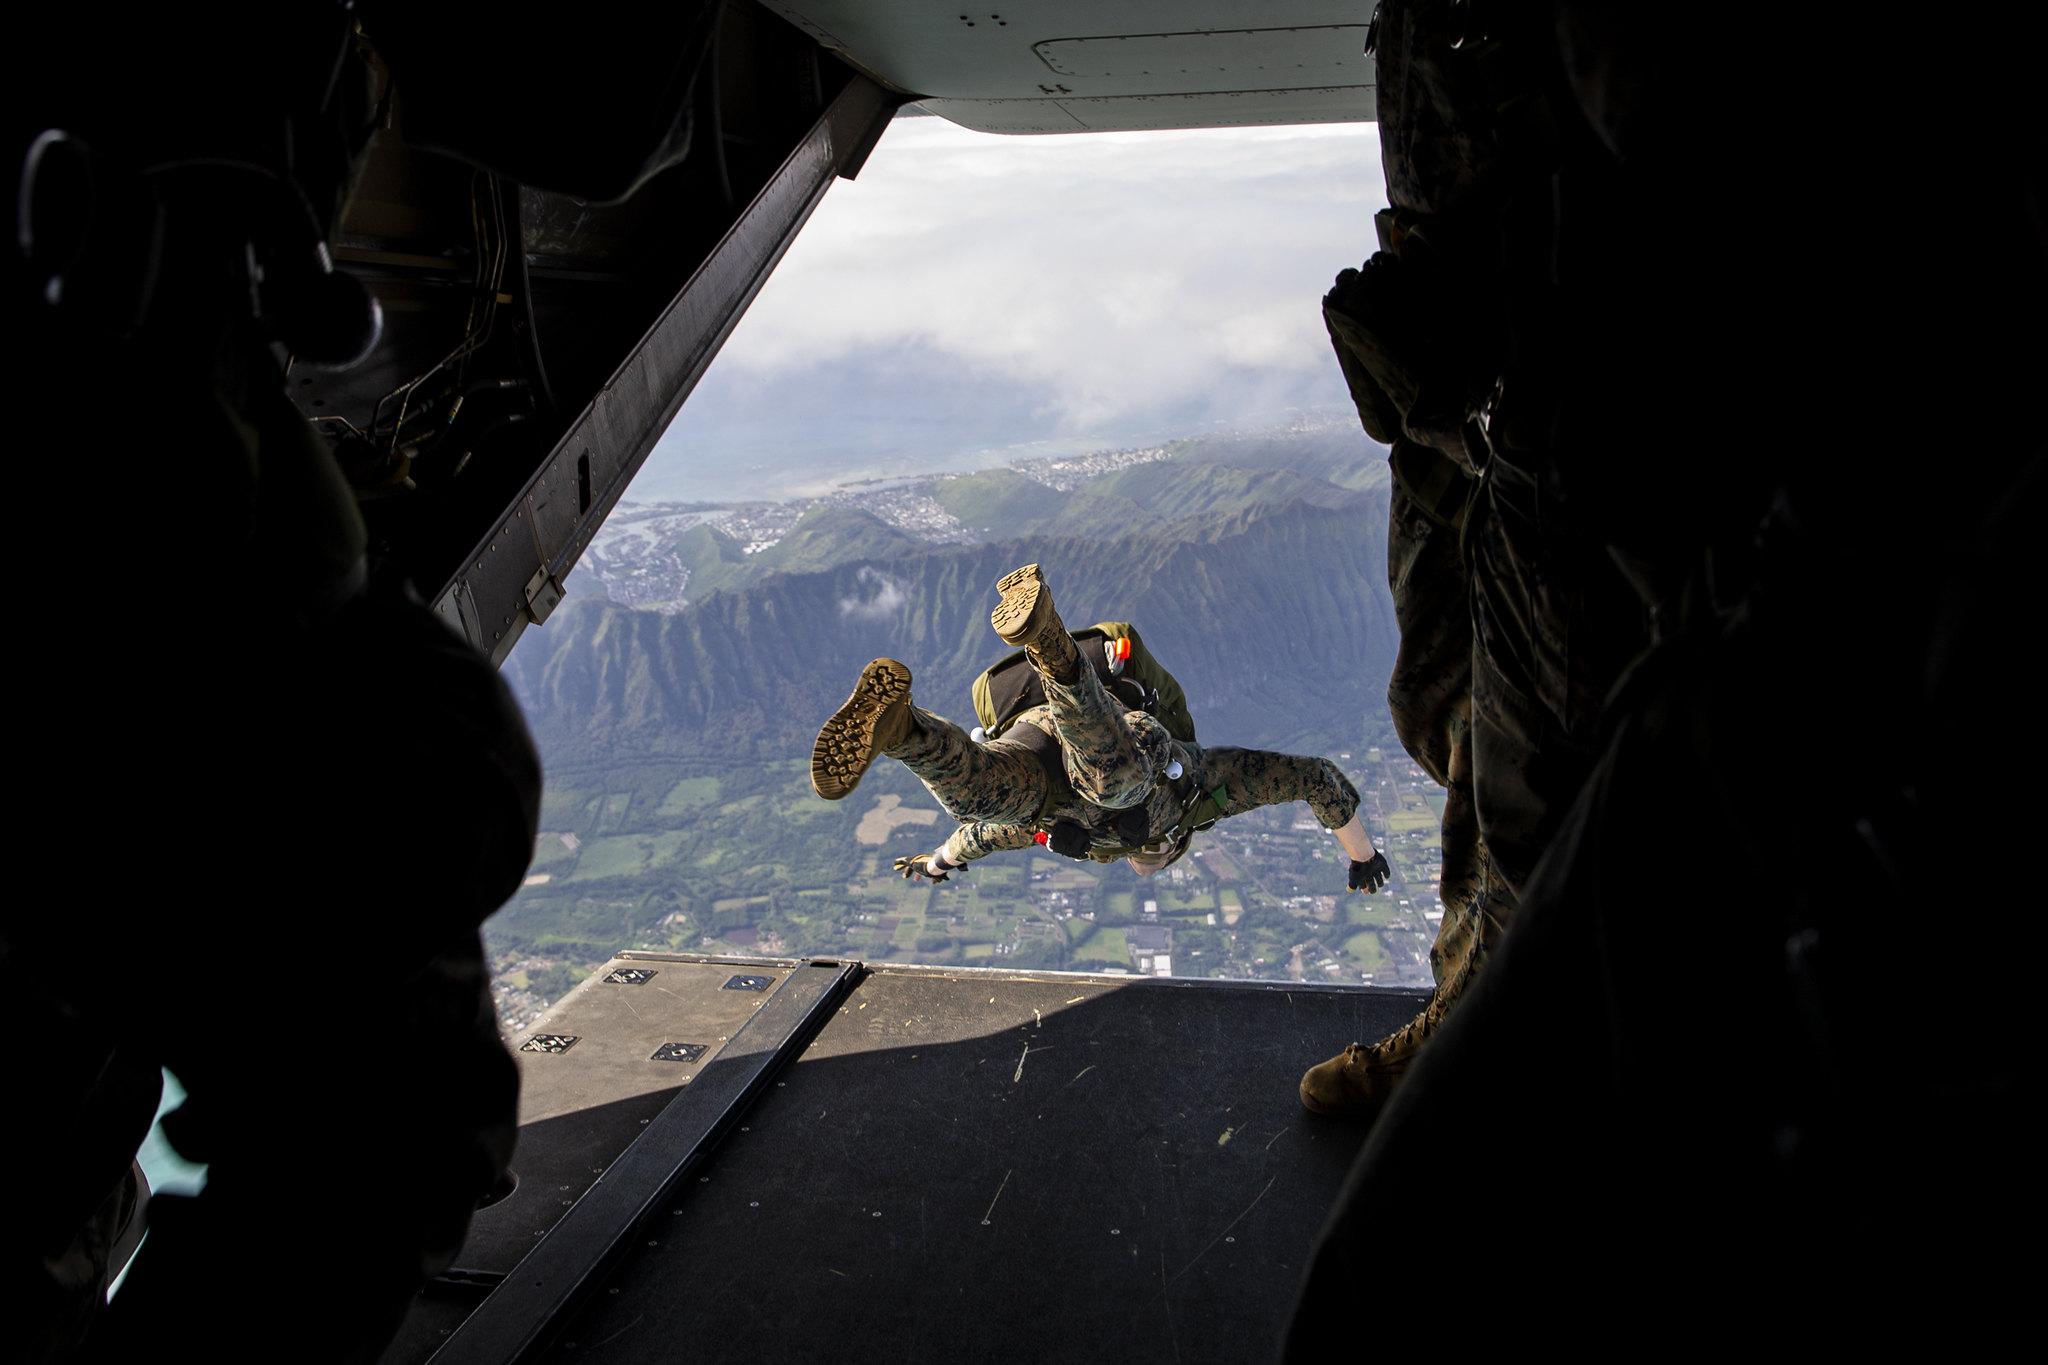 A U.S. Marine jumps during airborne operations Feb. 9, 2021, at Marine Corps Training Area Bellows, Hawaii. (Lance Cpl. Samantha Sanchez/Marine Corps)